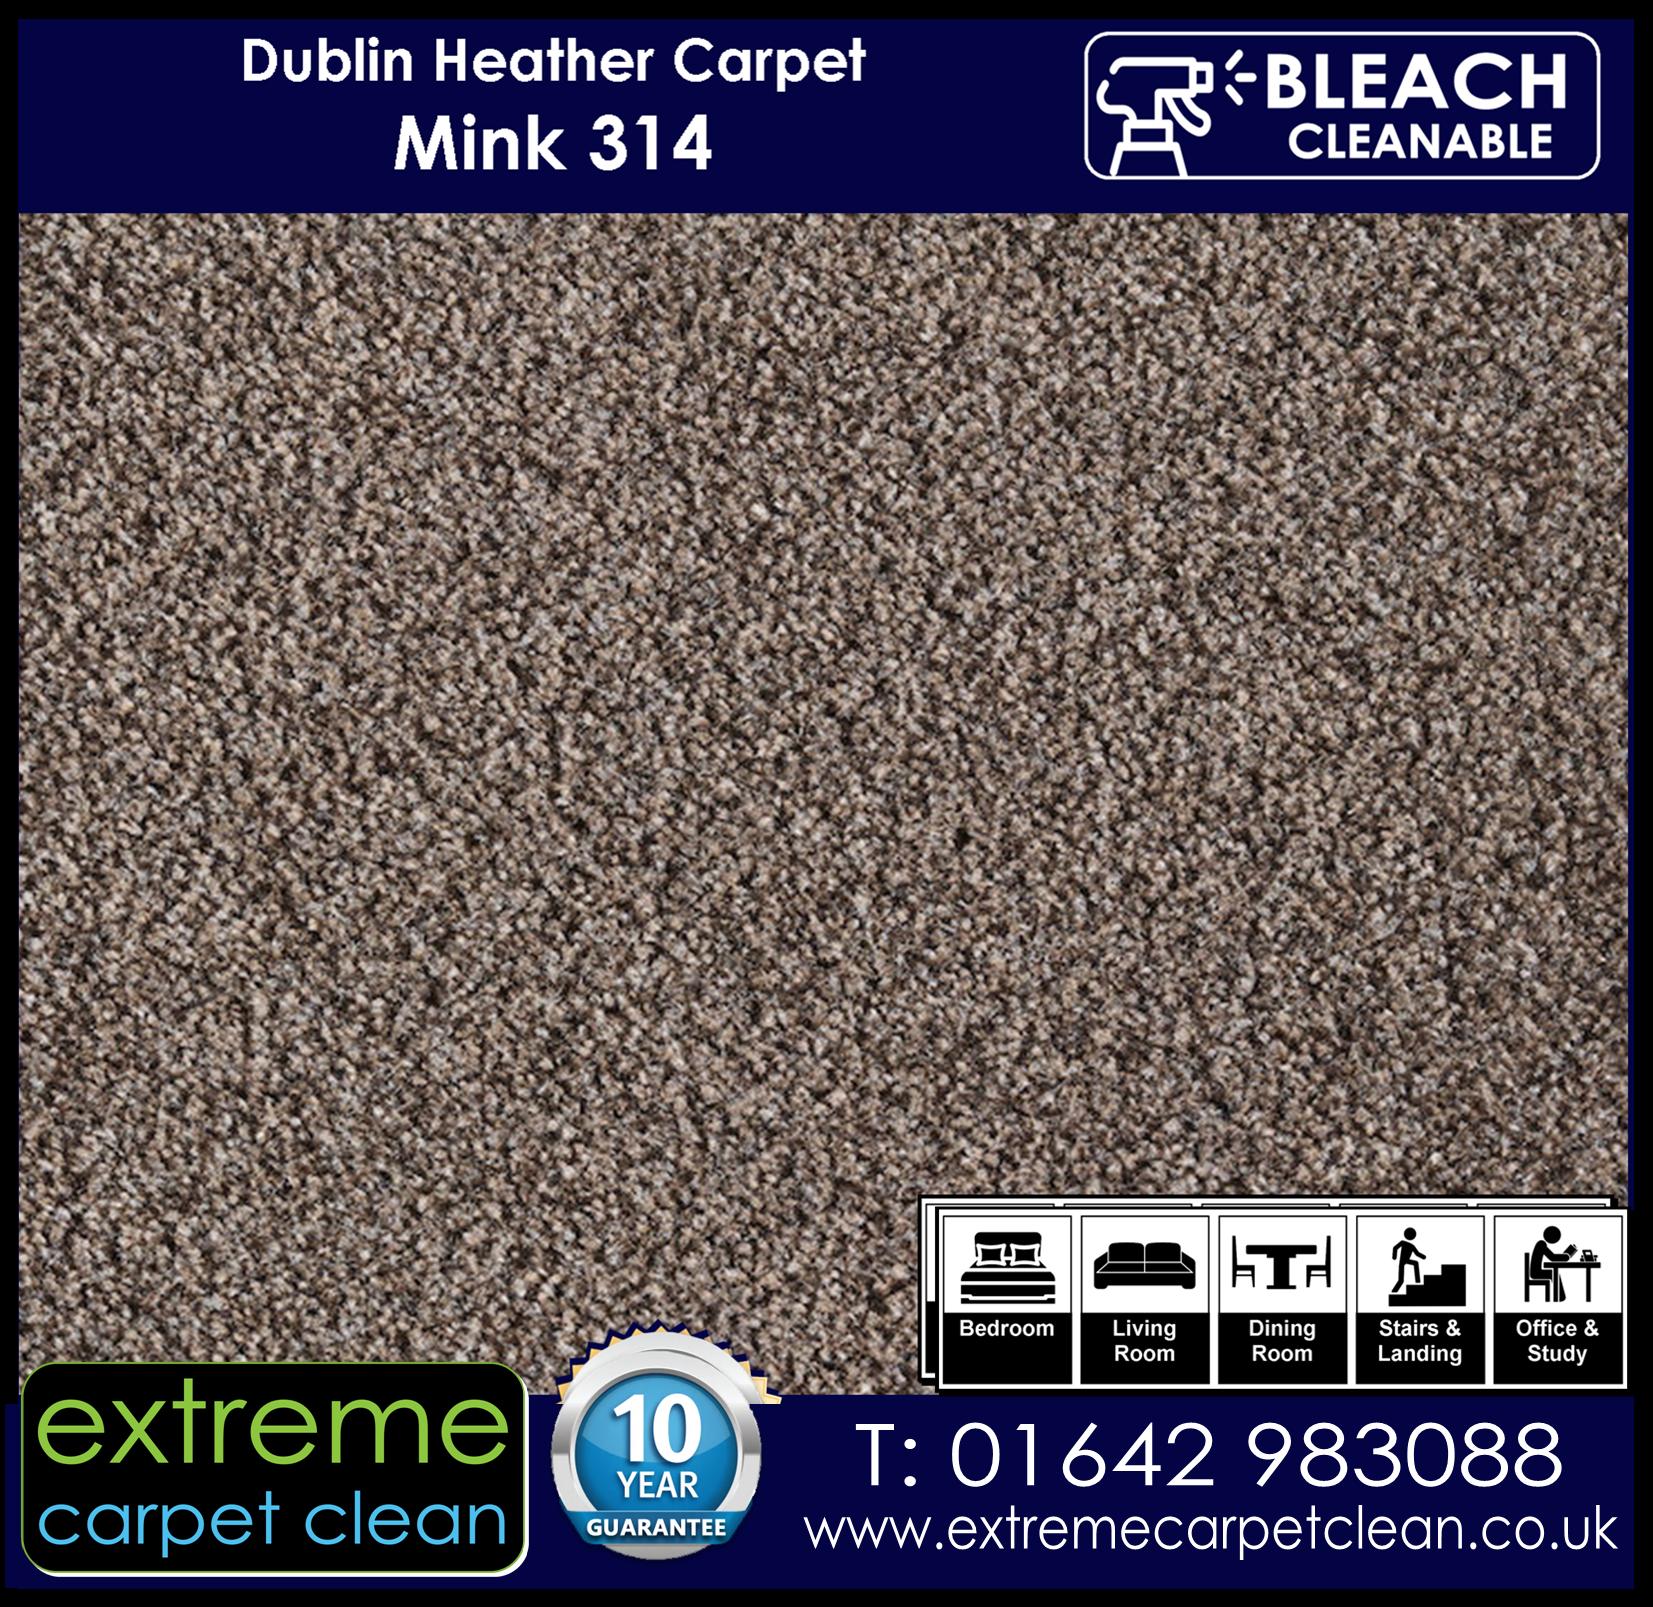 Dublin Heather Carpet Range. Mink 314 Extreme Carpet Clean